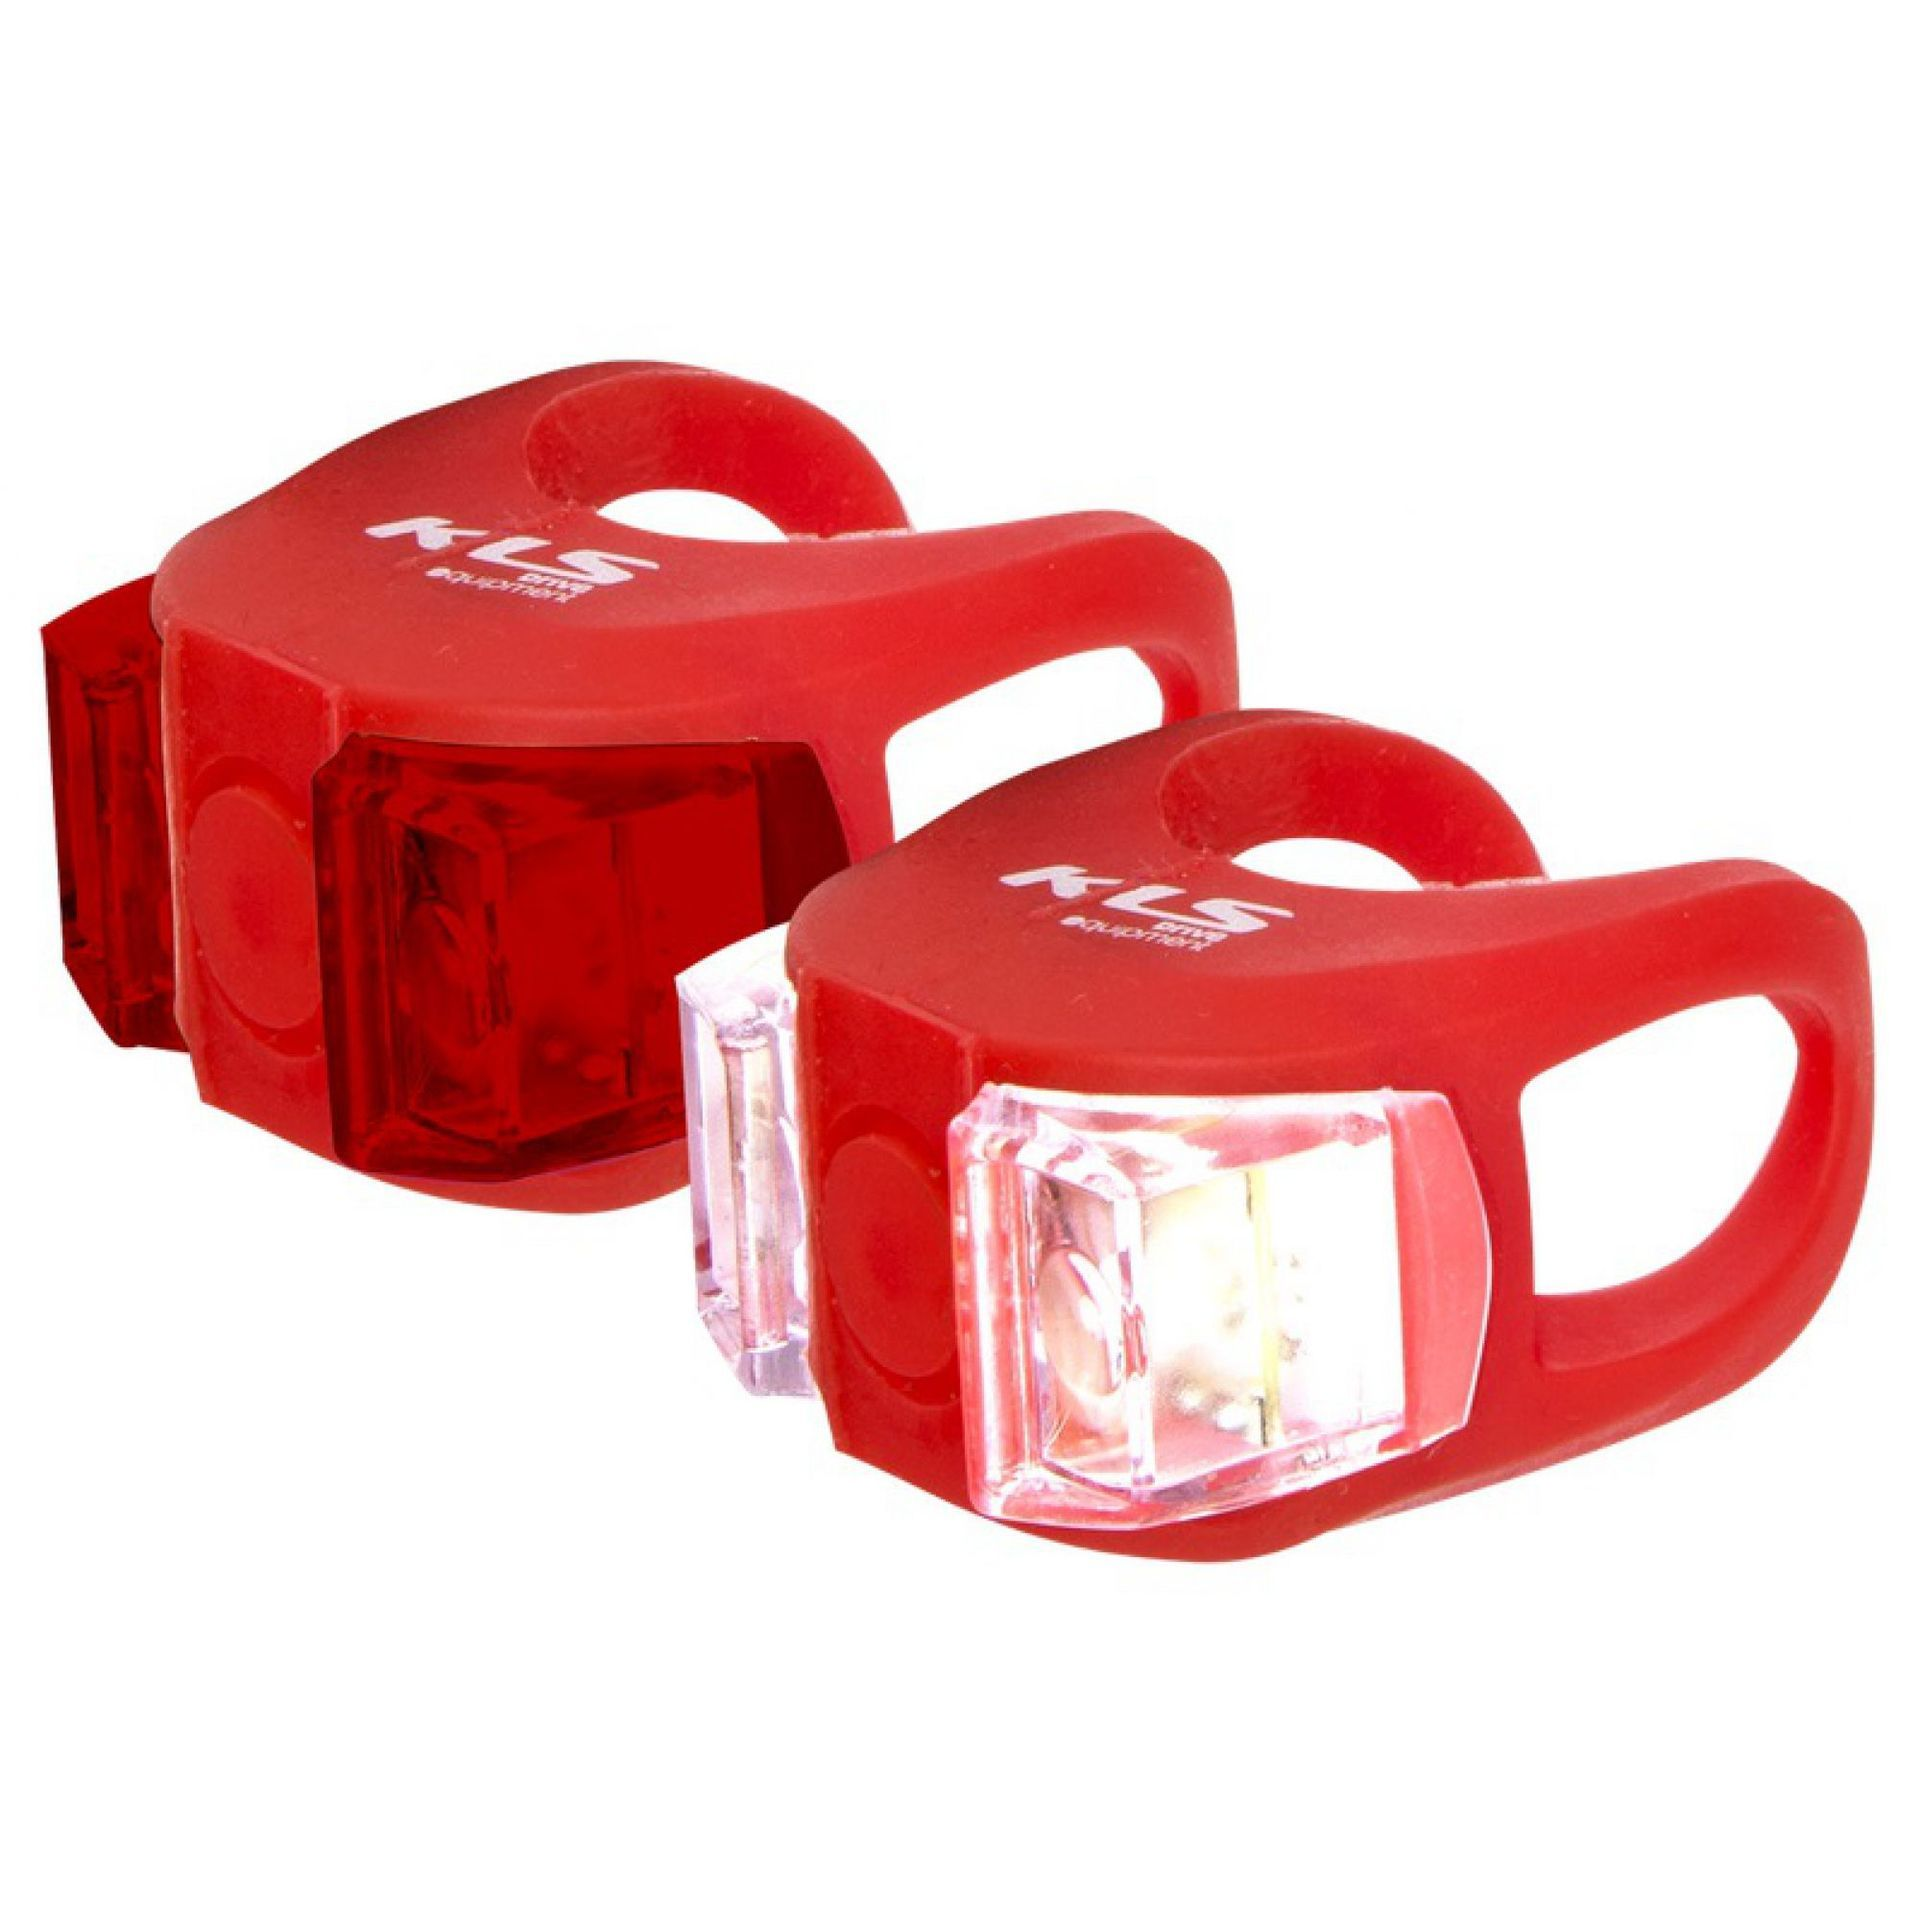 ZESTAW LAMPEK ROWEROWYCH KELLYS TWINS RED